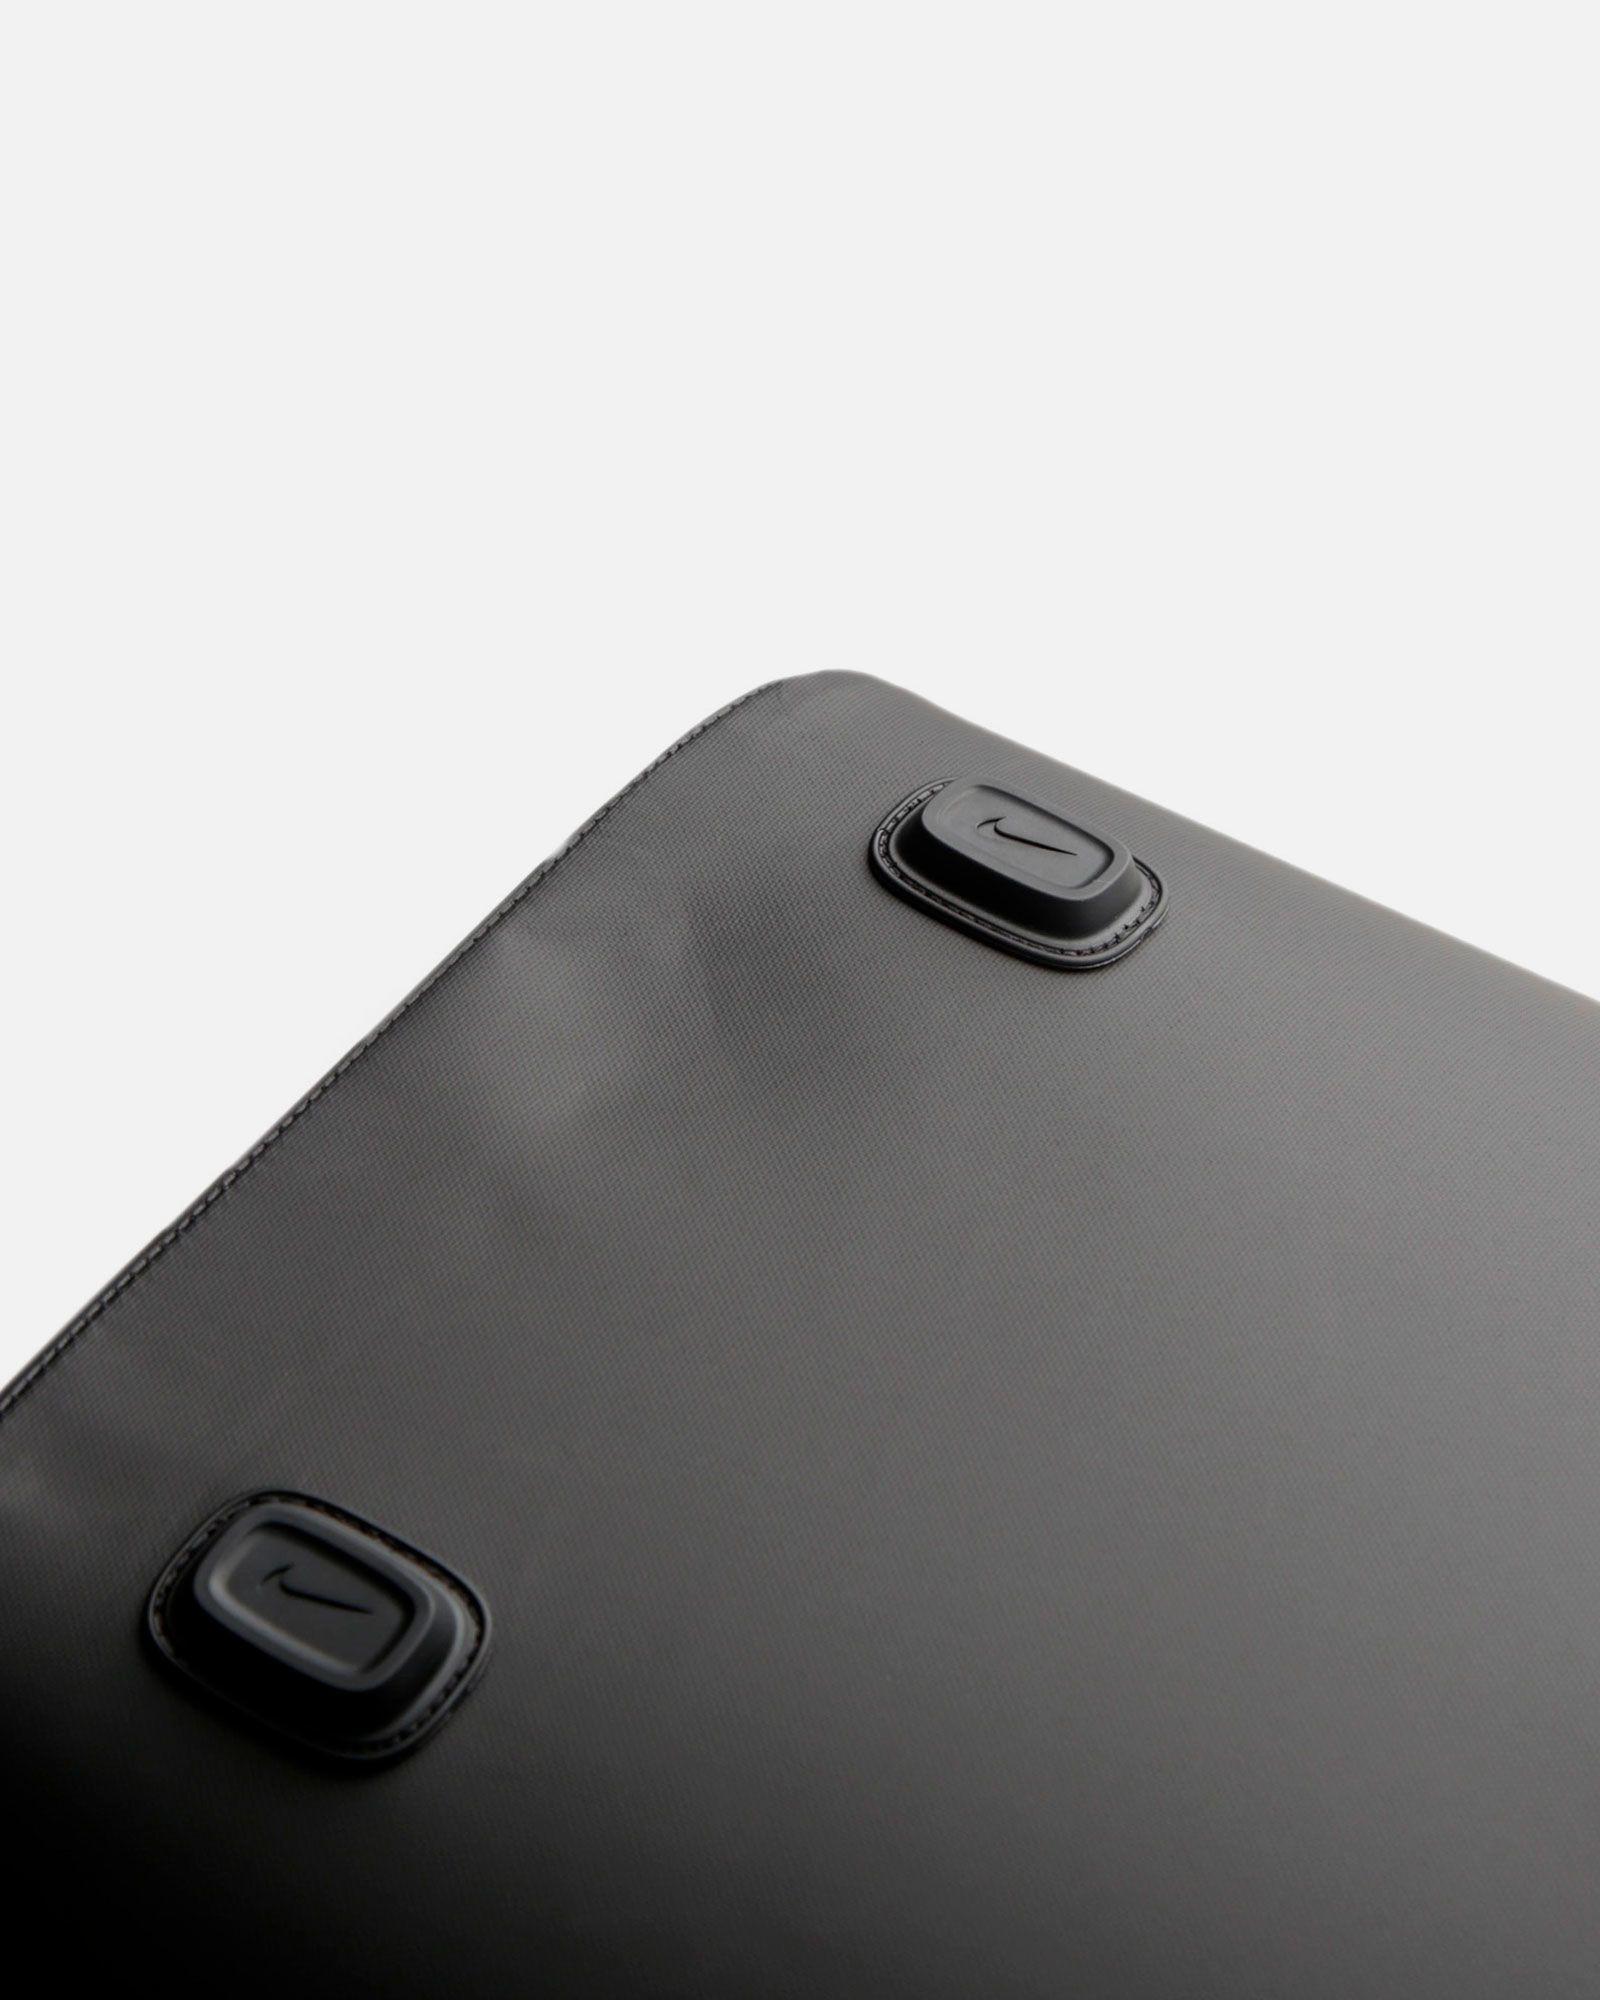 image-product-zoom